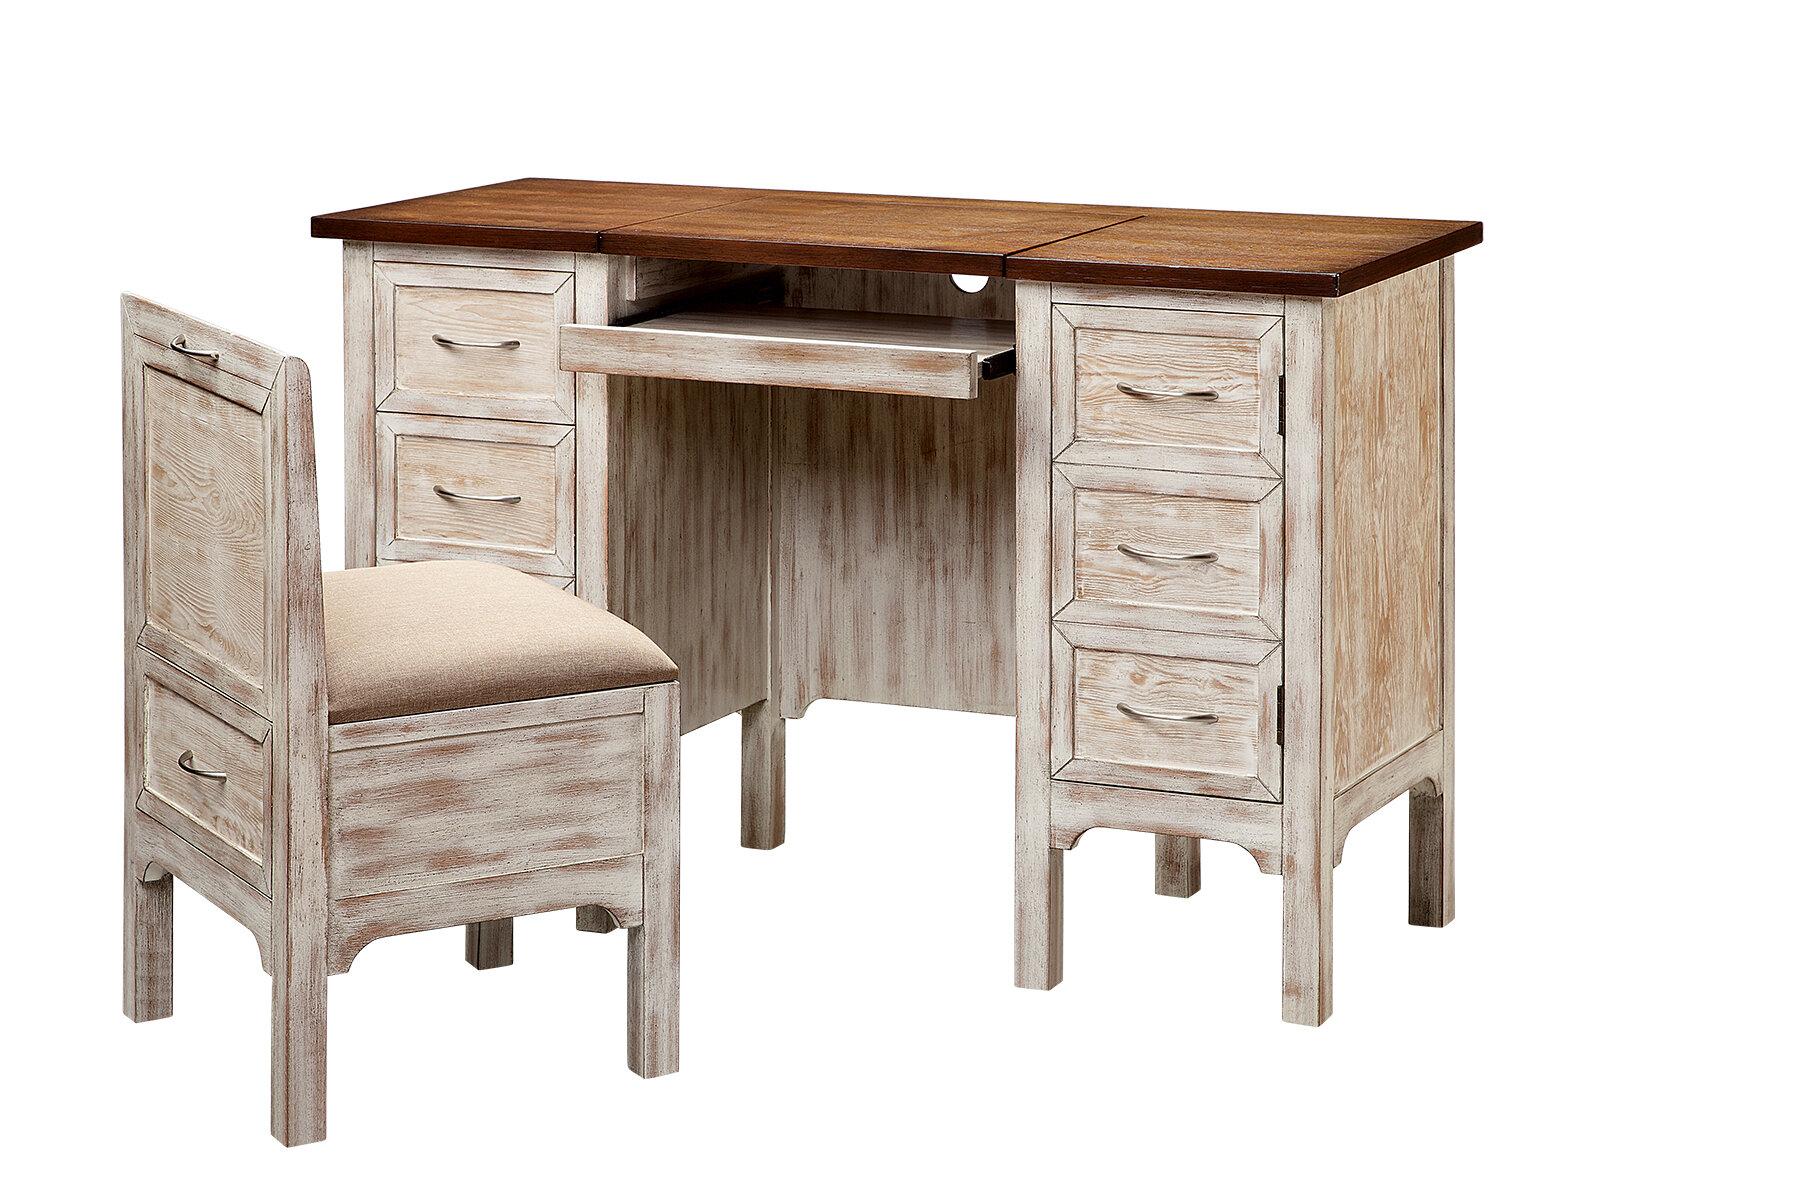 Image of: One Allium Way Bridgnorth Computer Desk And Chair Set Reviews Wayfair Ca